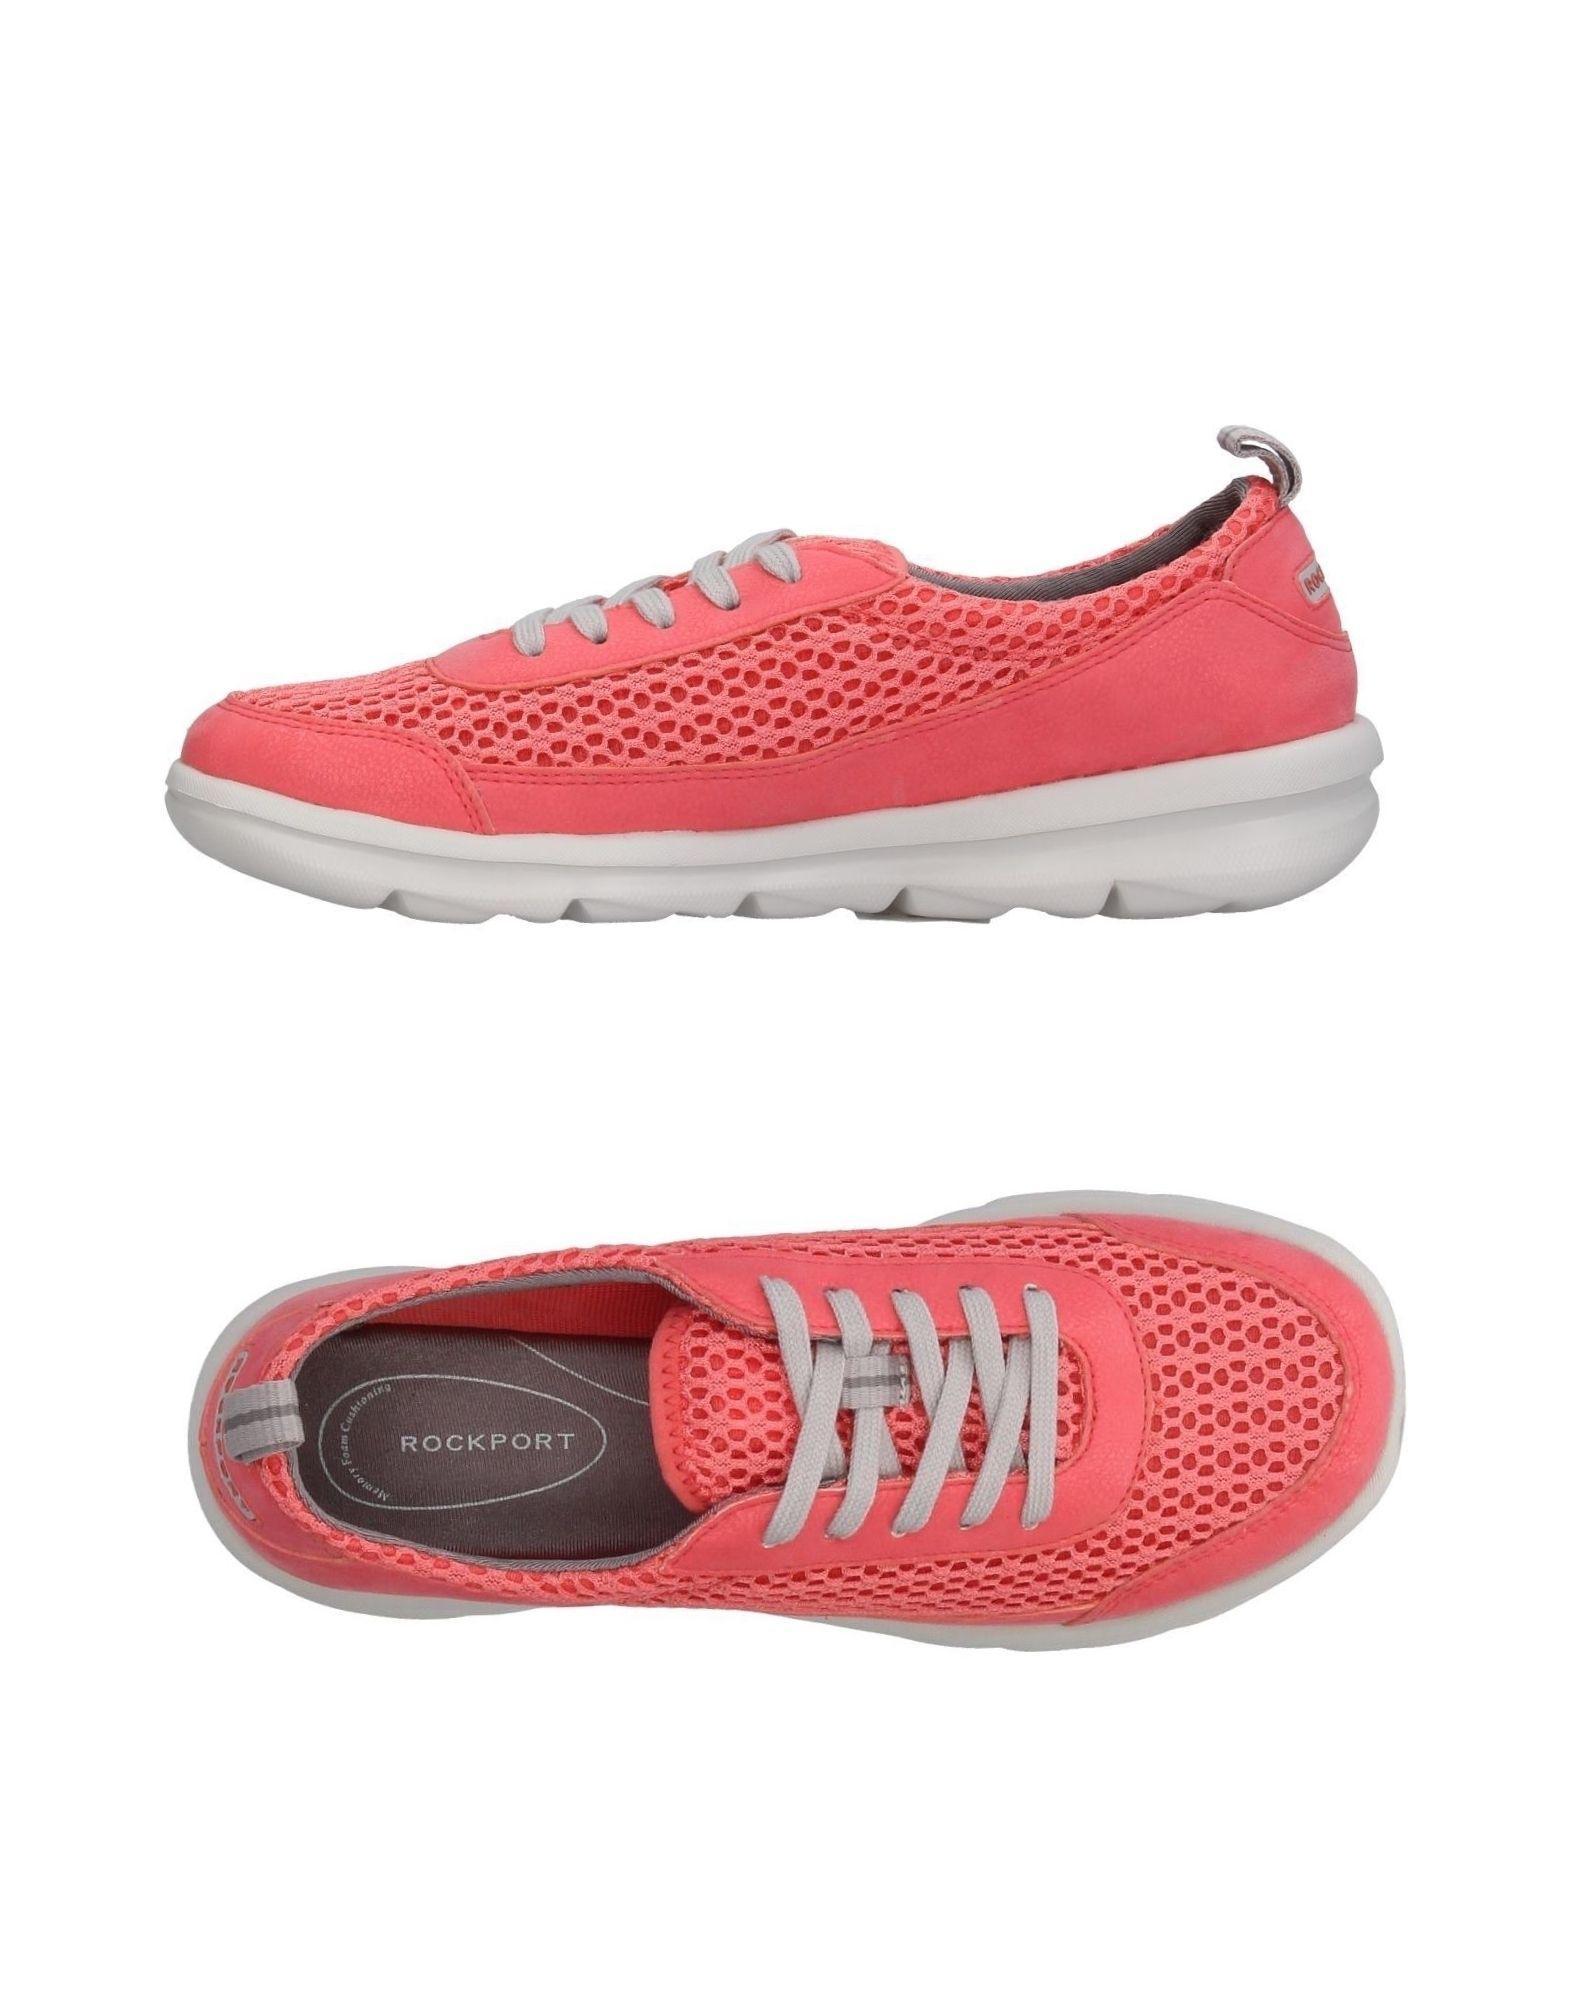 FOOTWEAR - Low-tops & sneakers Rockport DpBDs